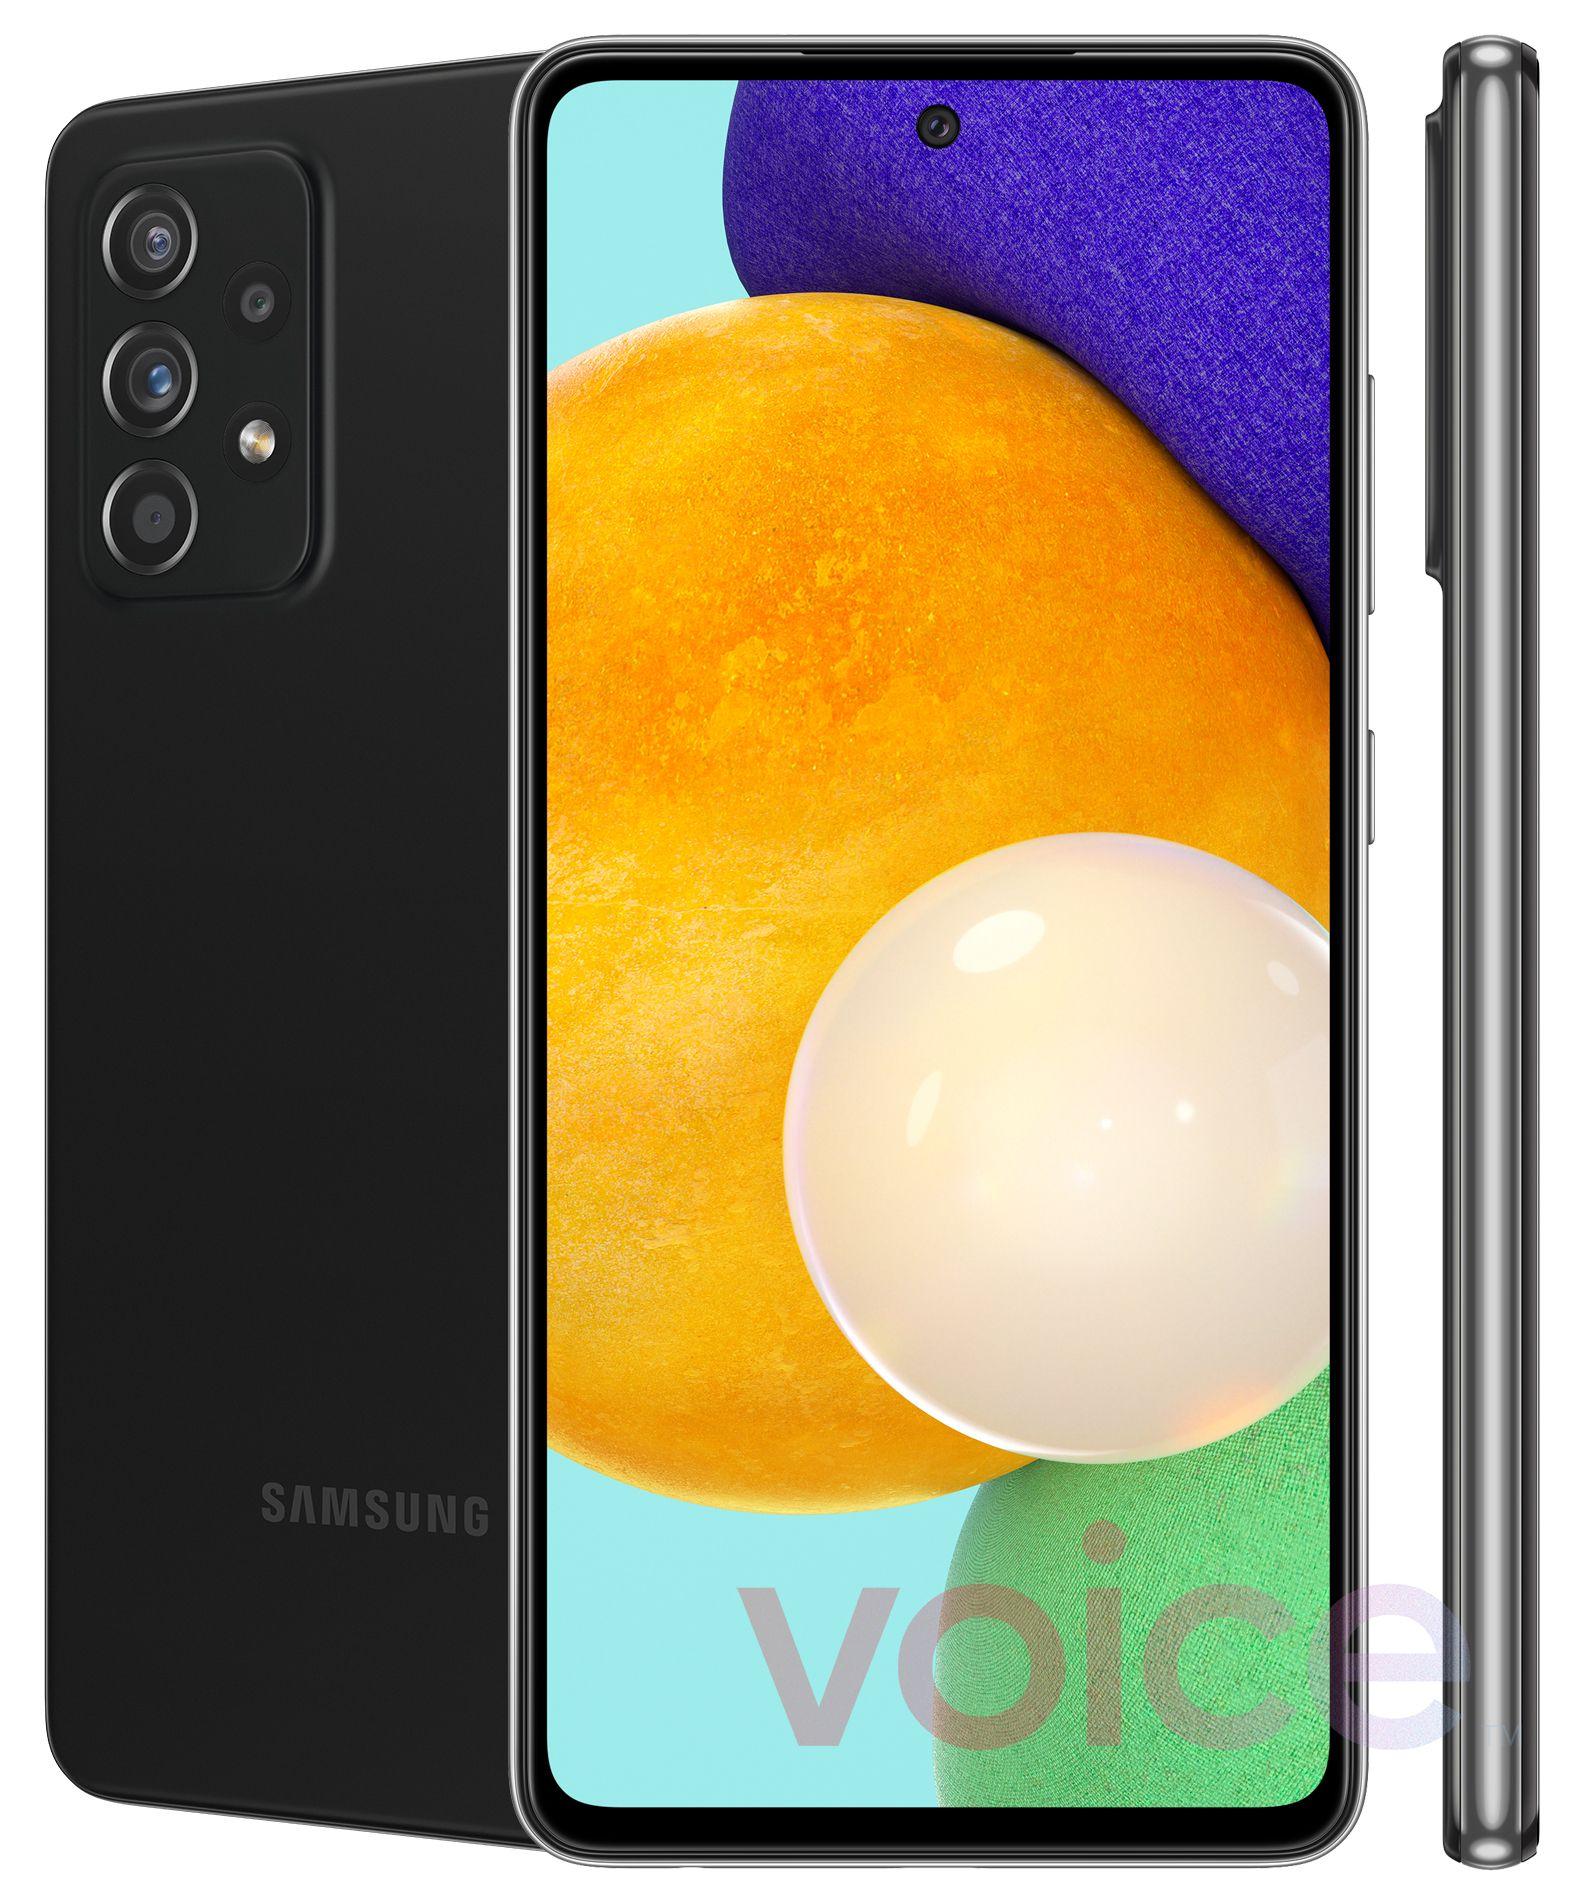 Samsung Galaxy A52 渲染图